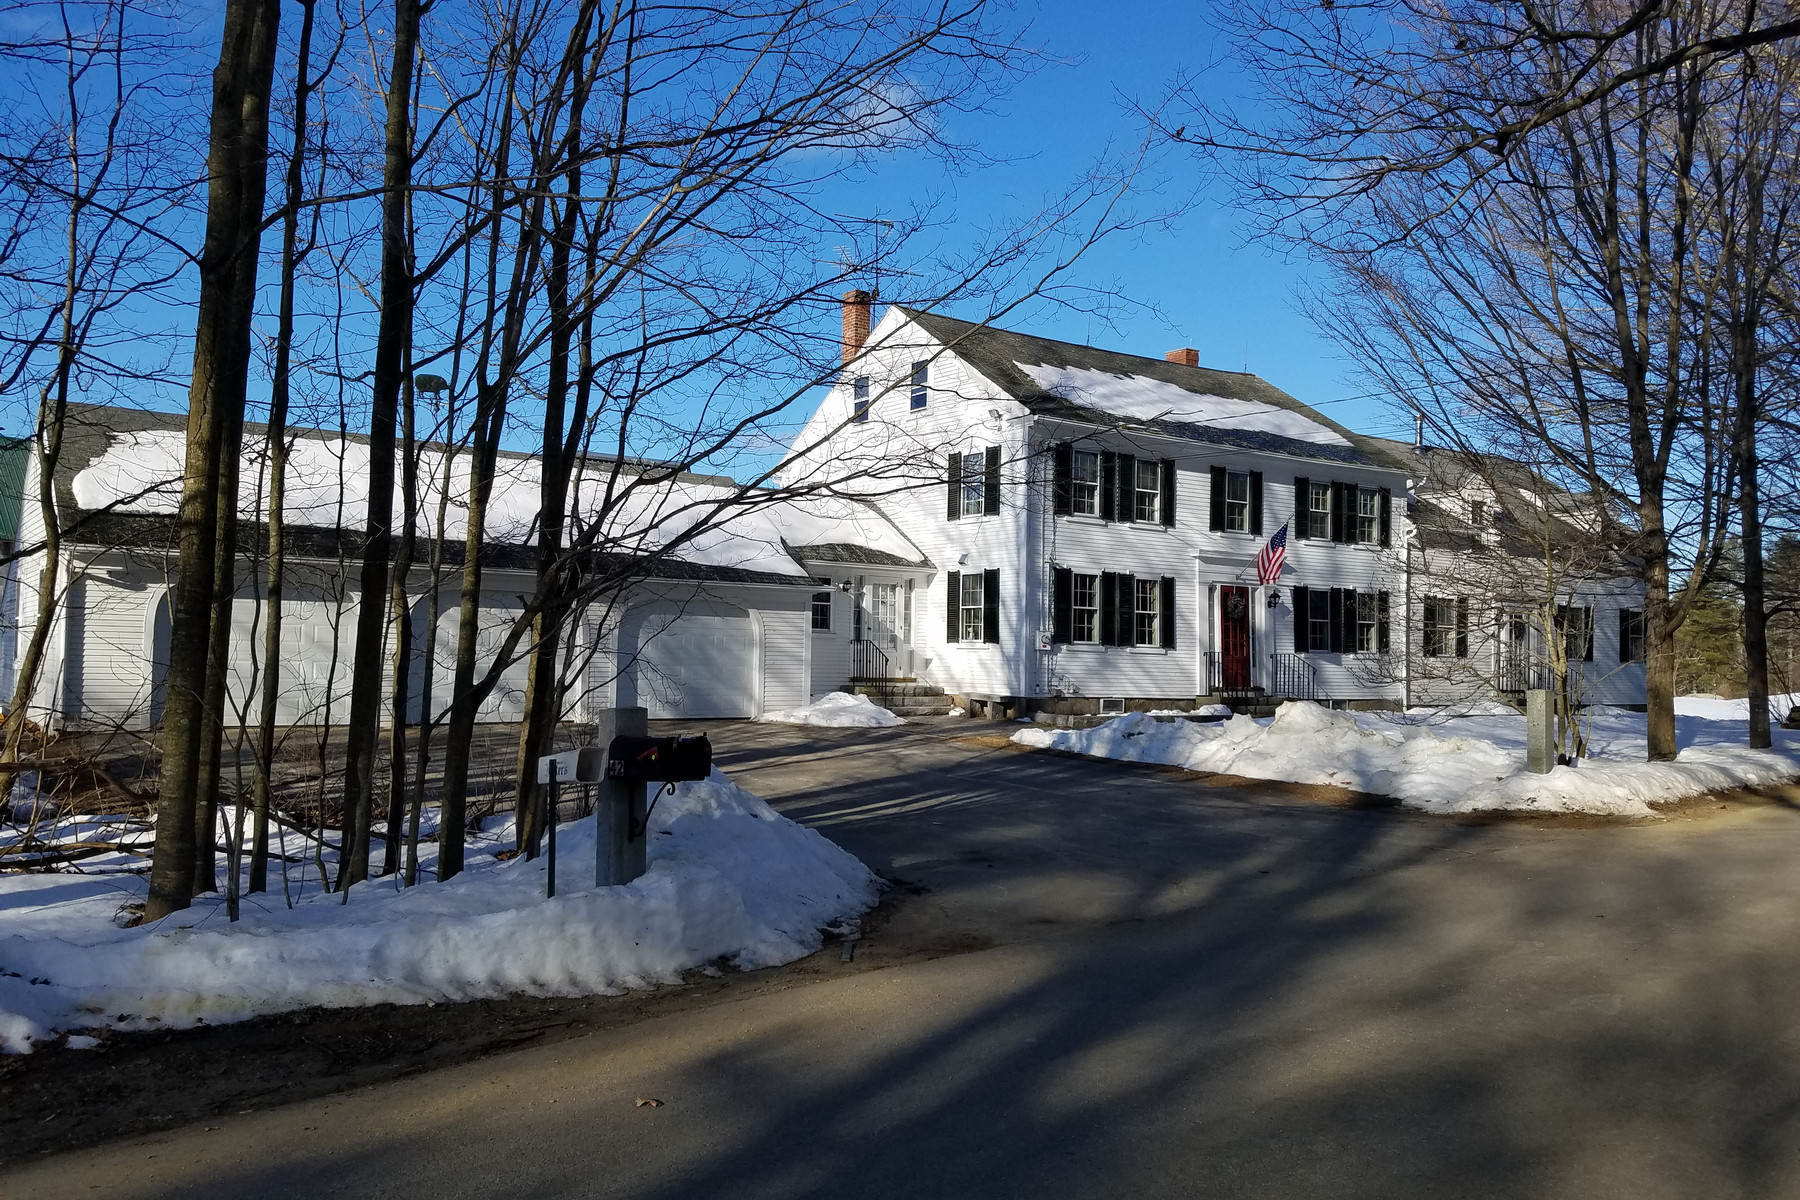 多户住宅 为 销售 在 Old Orchard Farm 42 Nute Road Madbury, 新罕布什尔州, 03823 美国